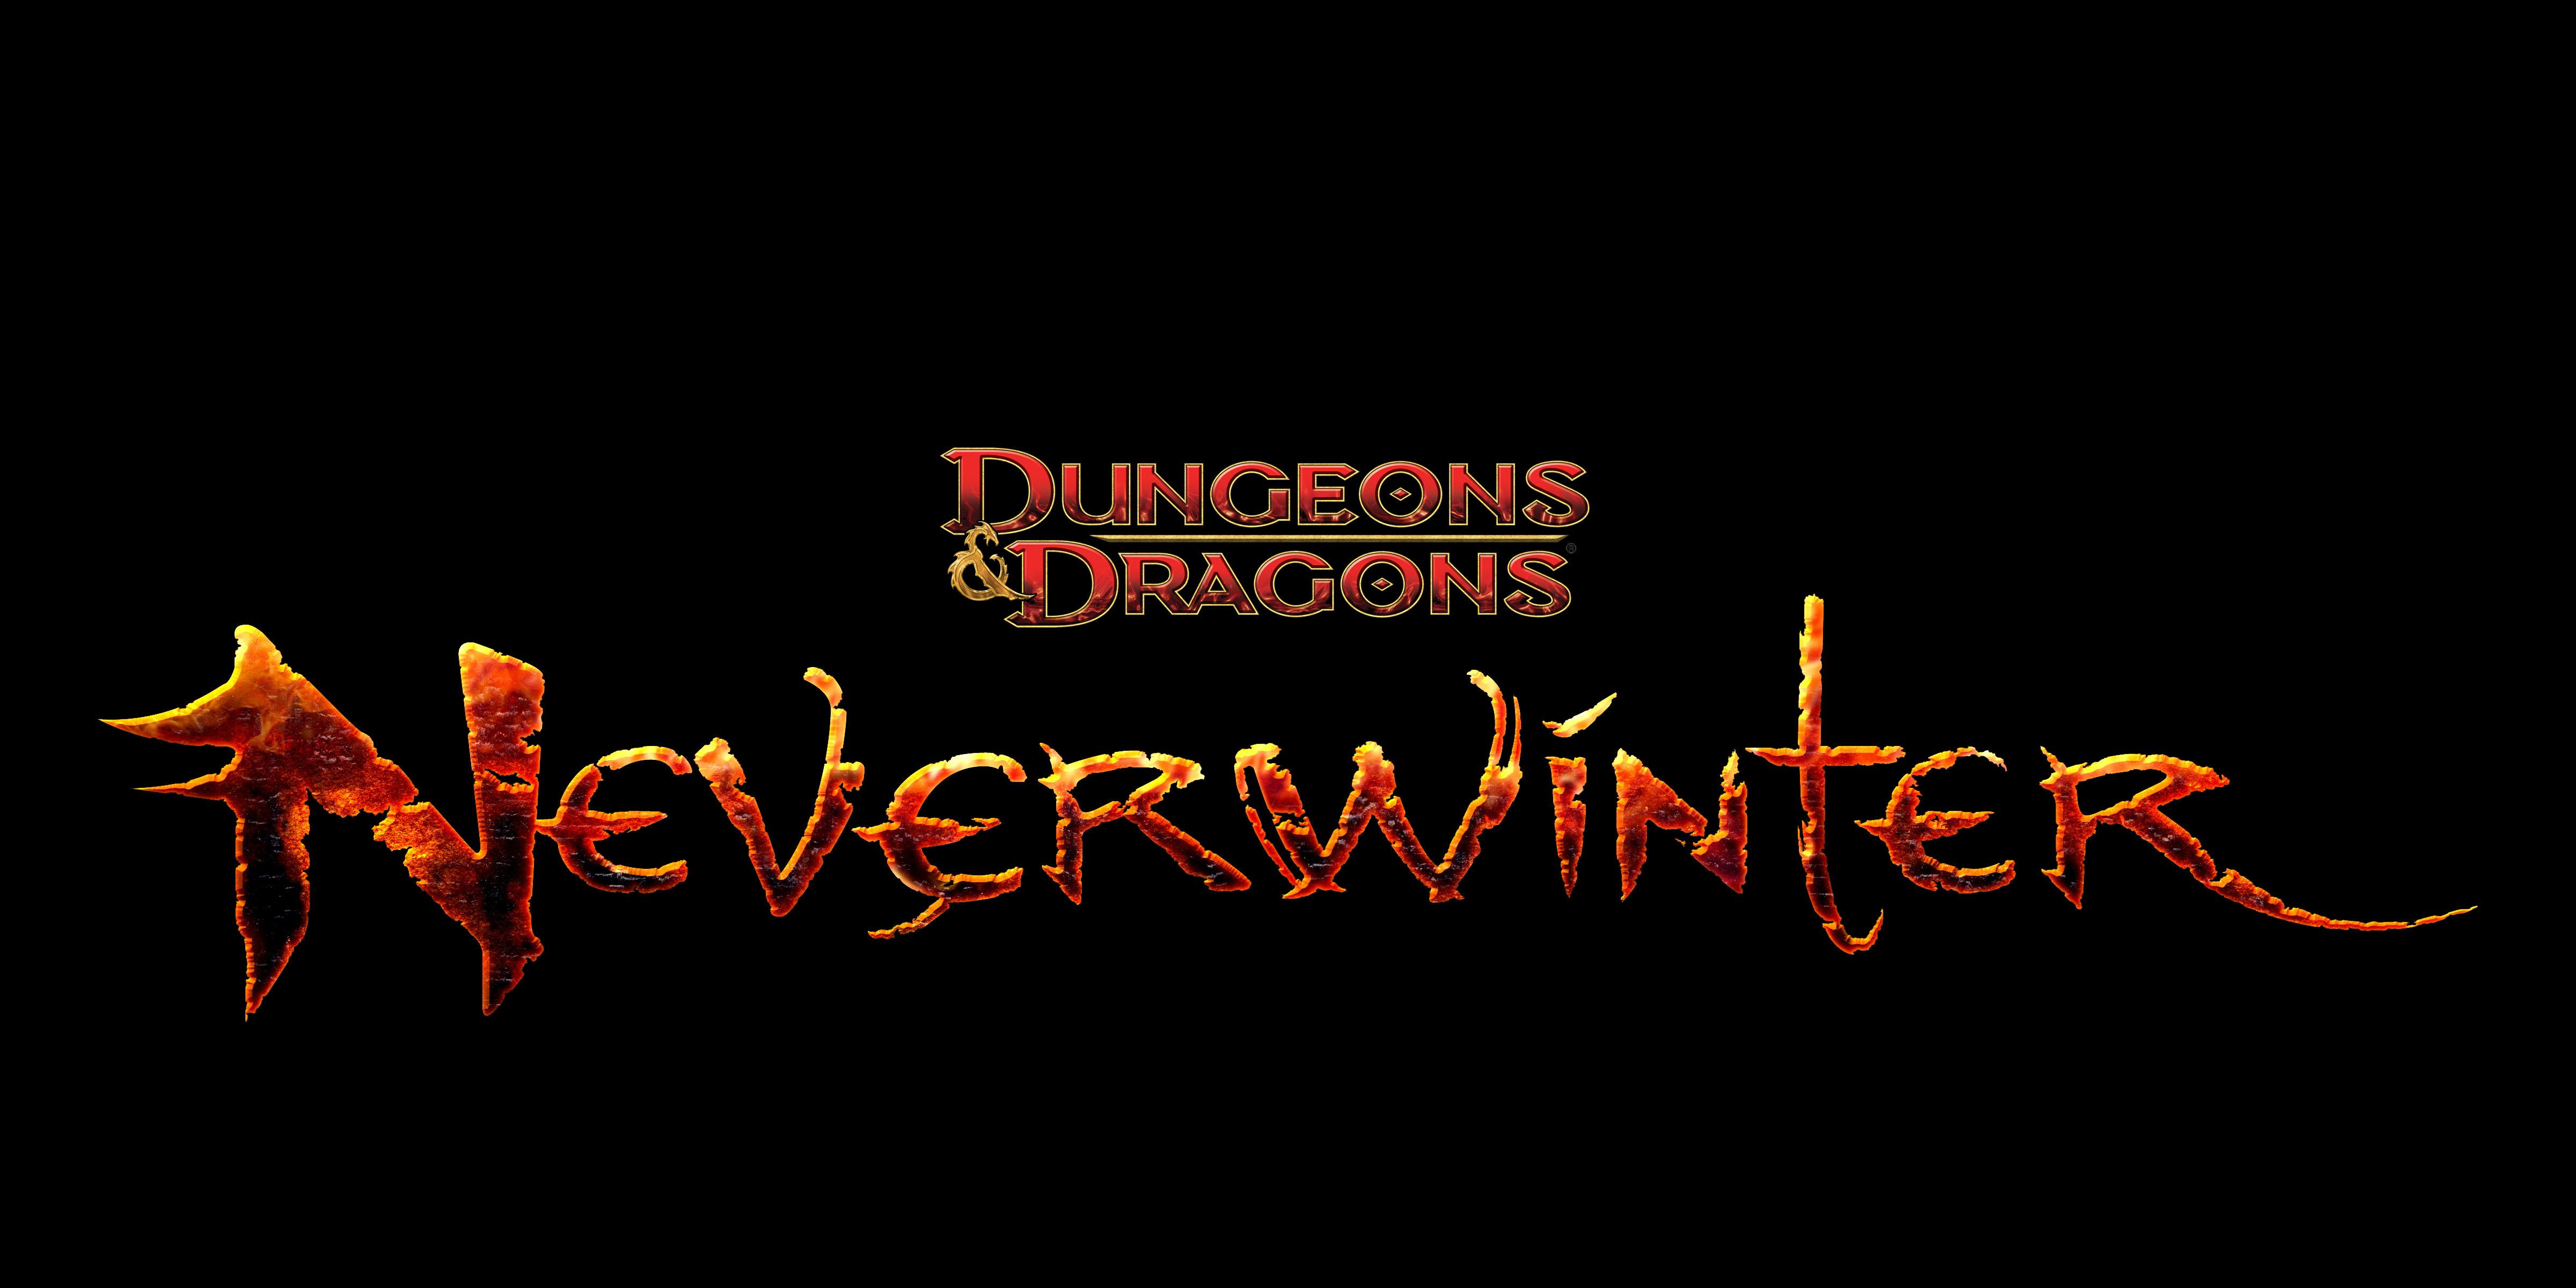 Neverwinter, la nueva aventura del universo D&D